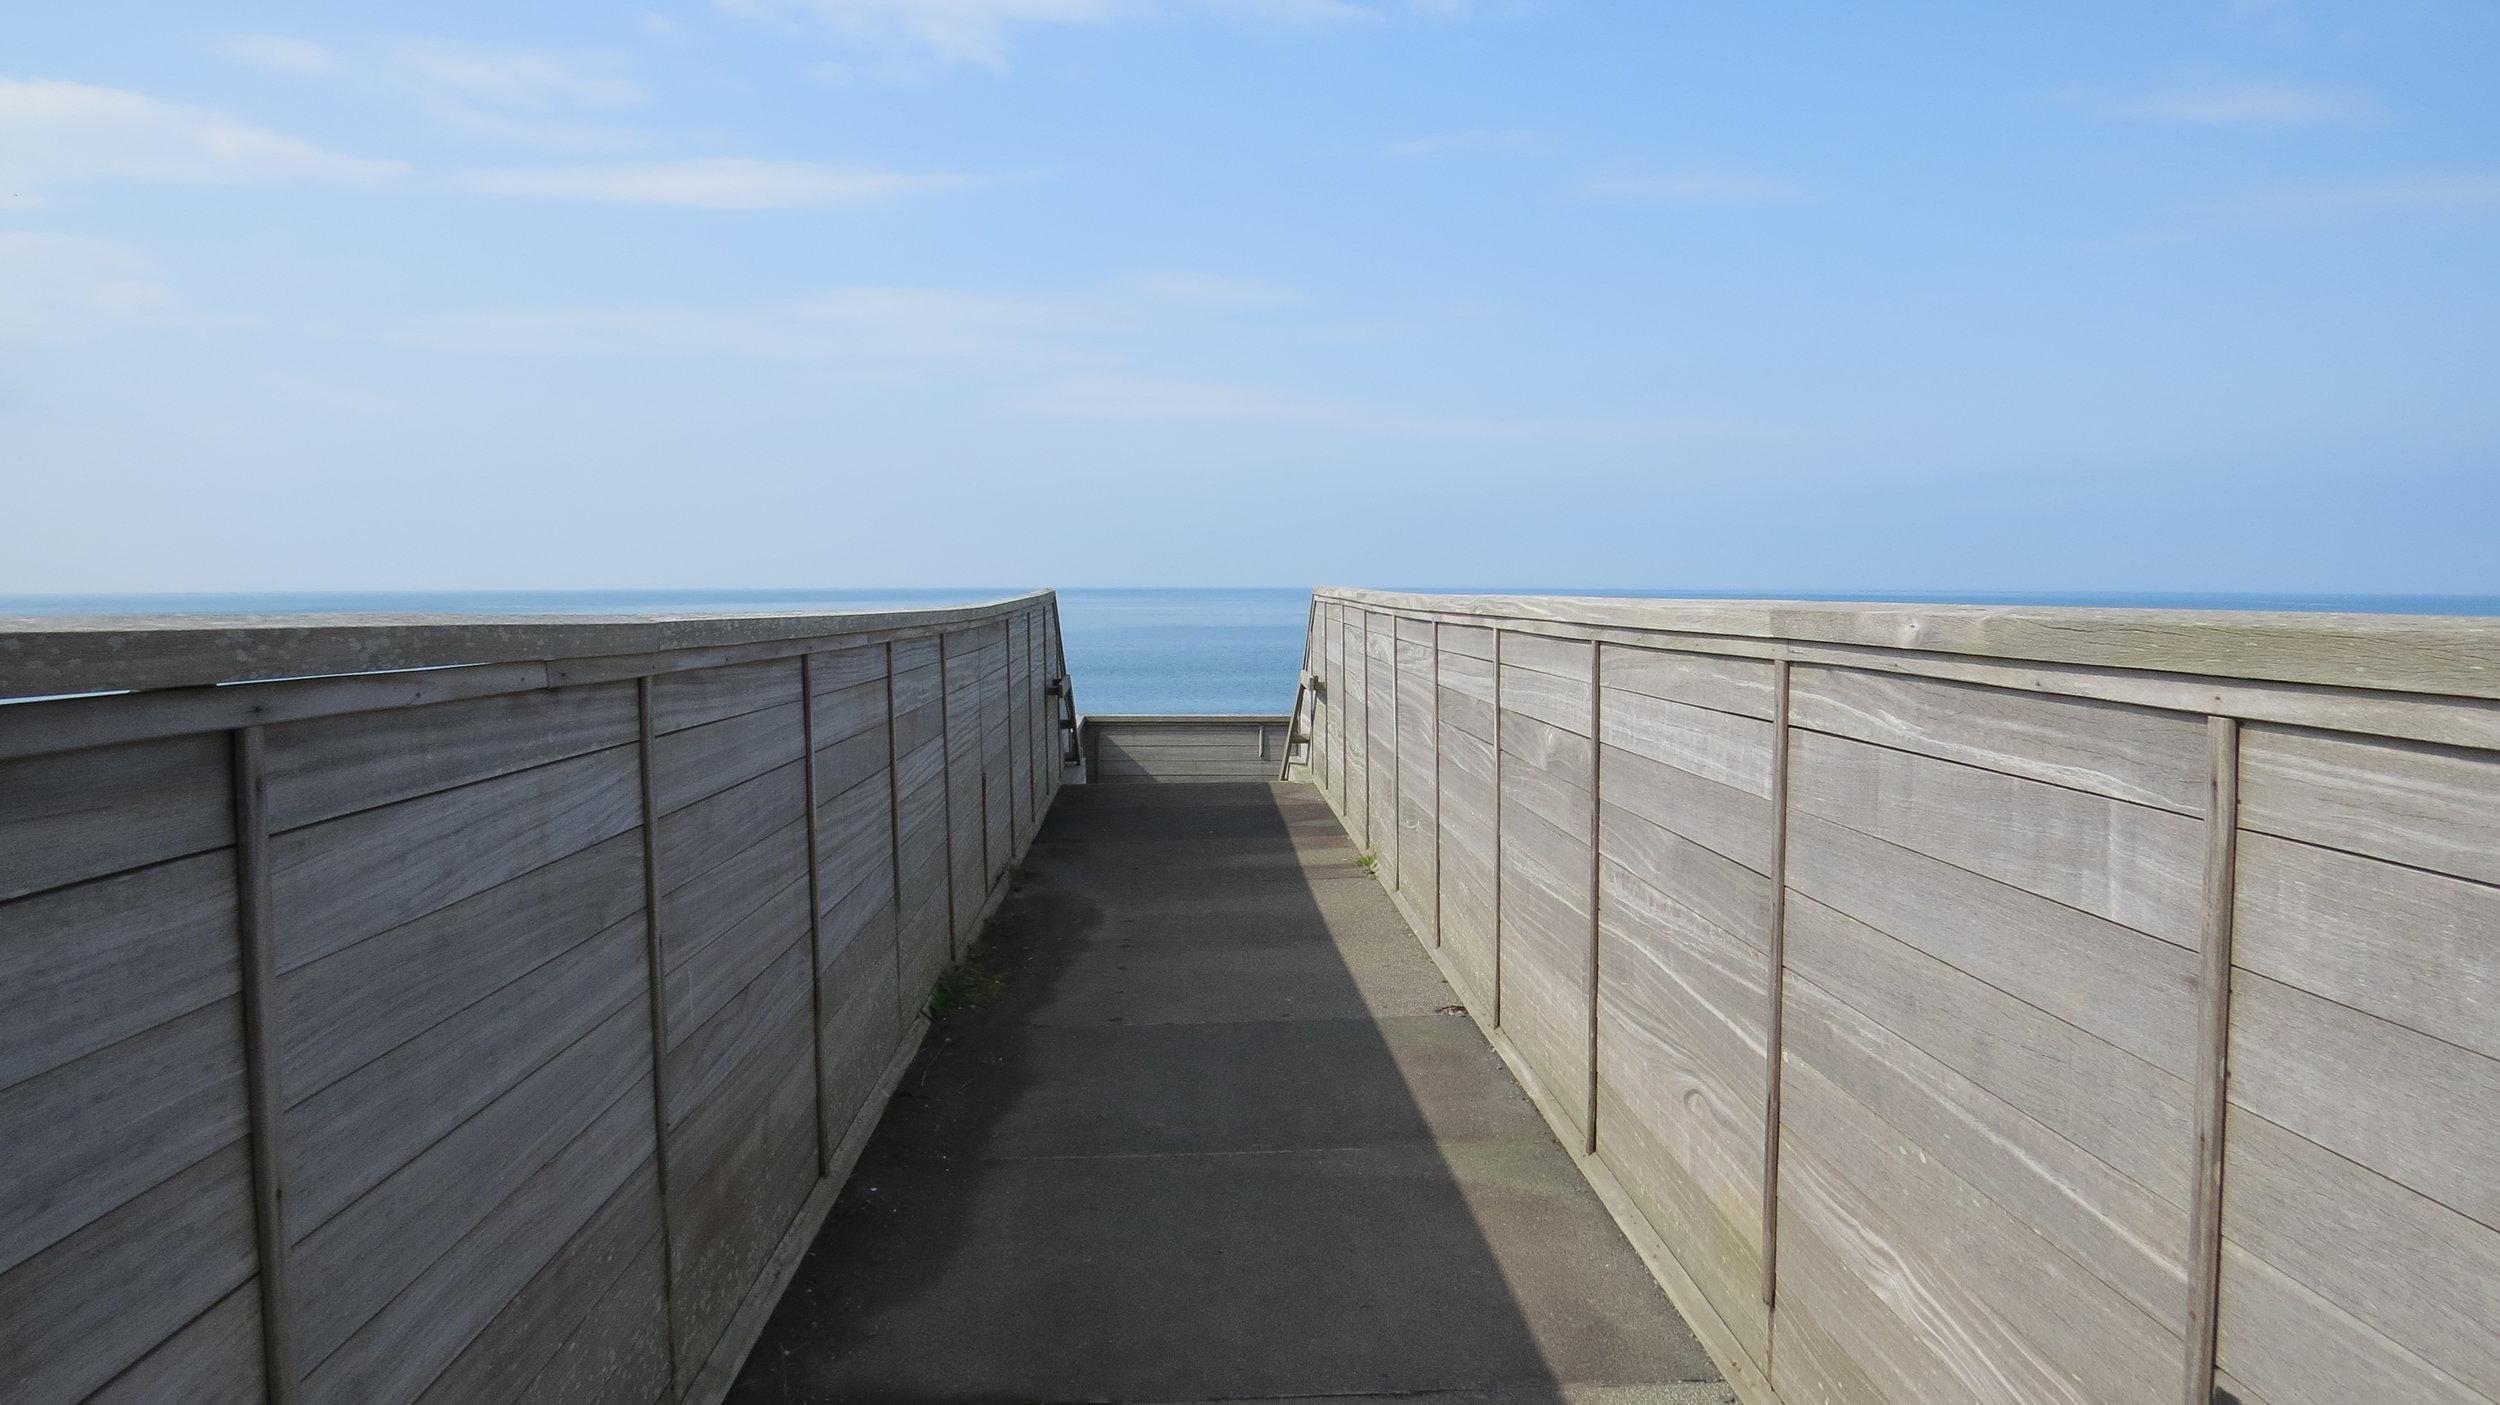 Bridge to the Sea